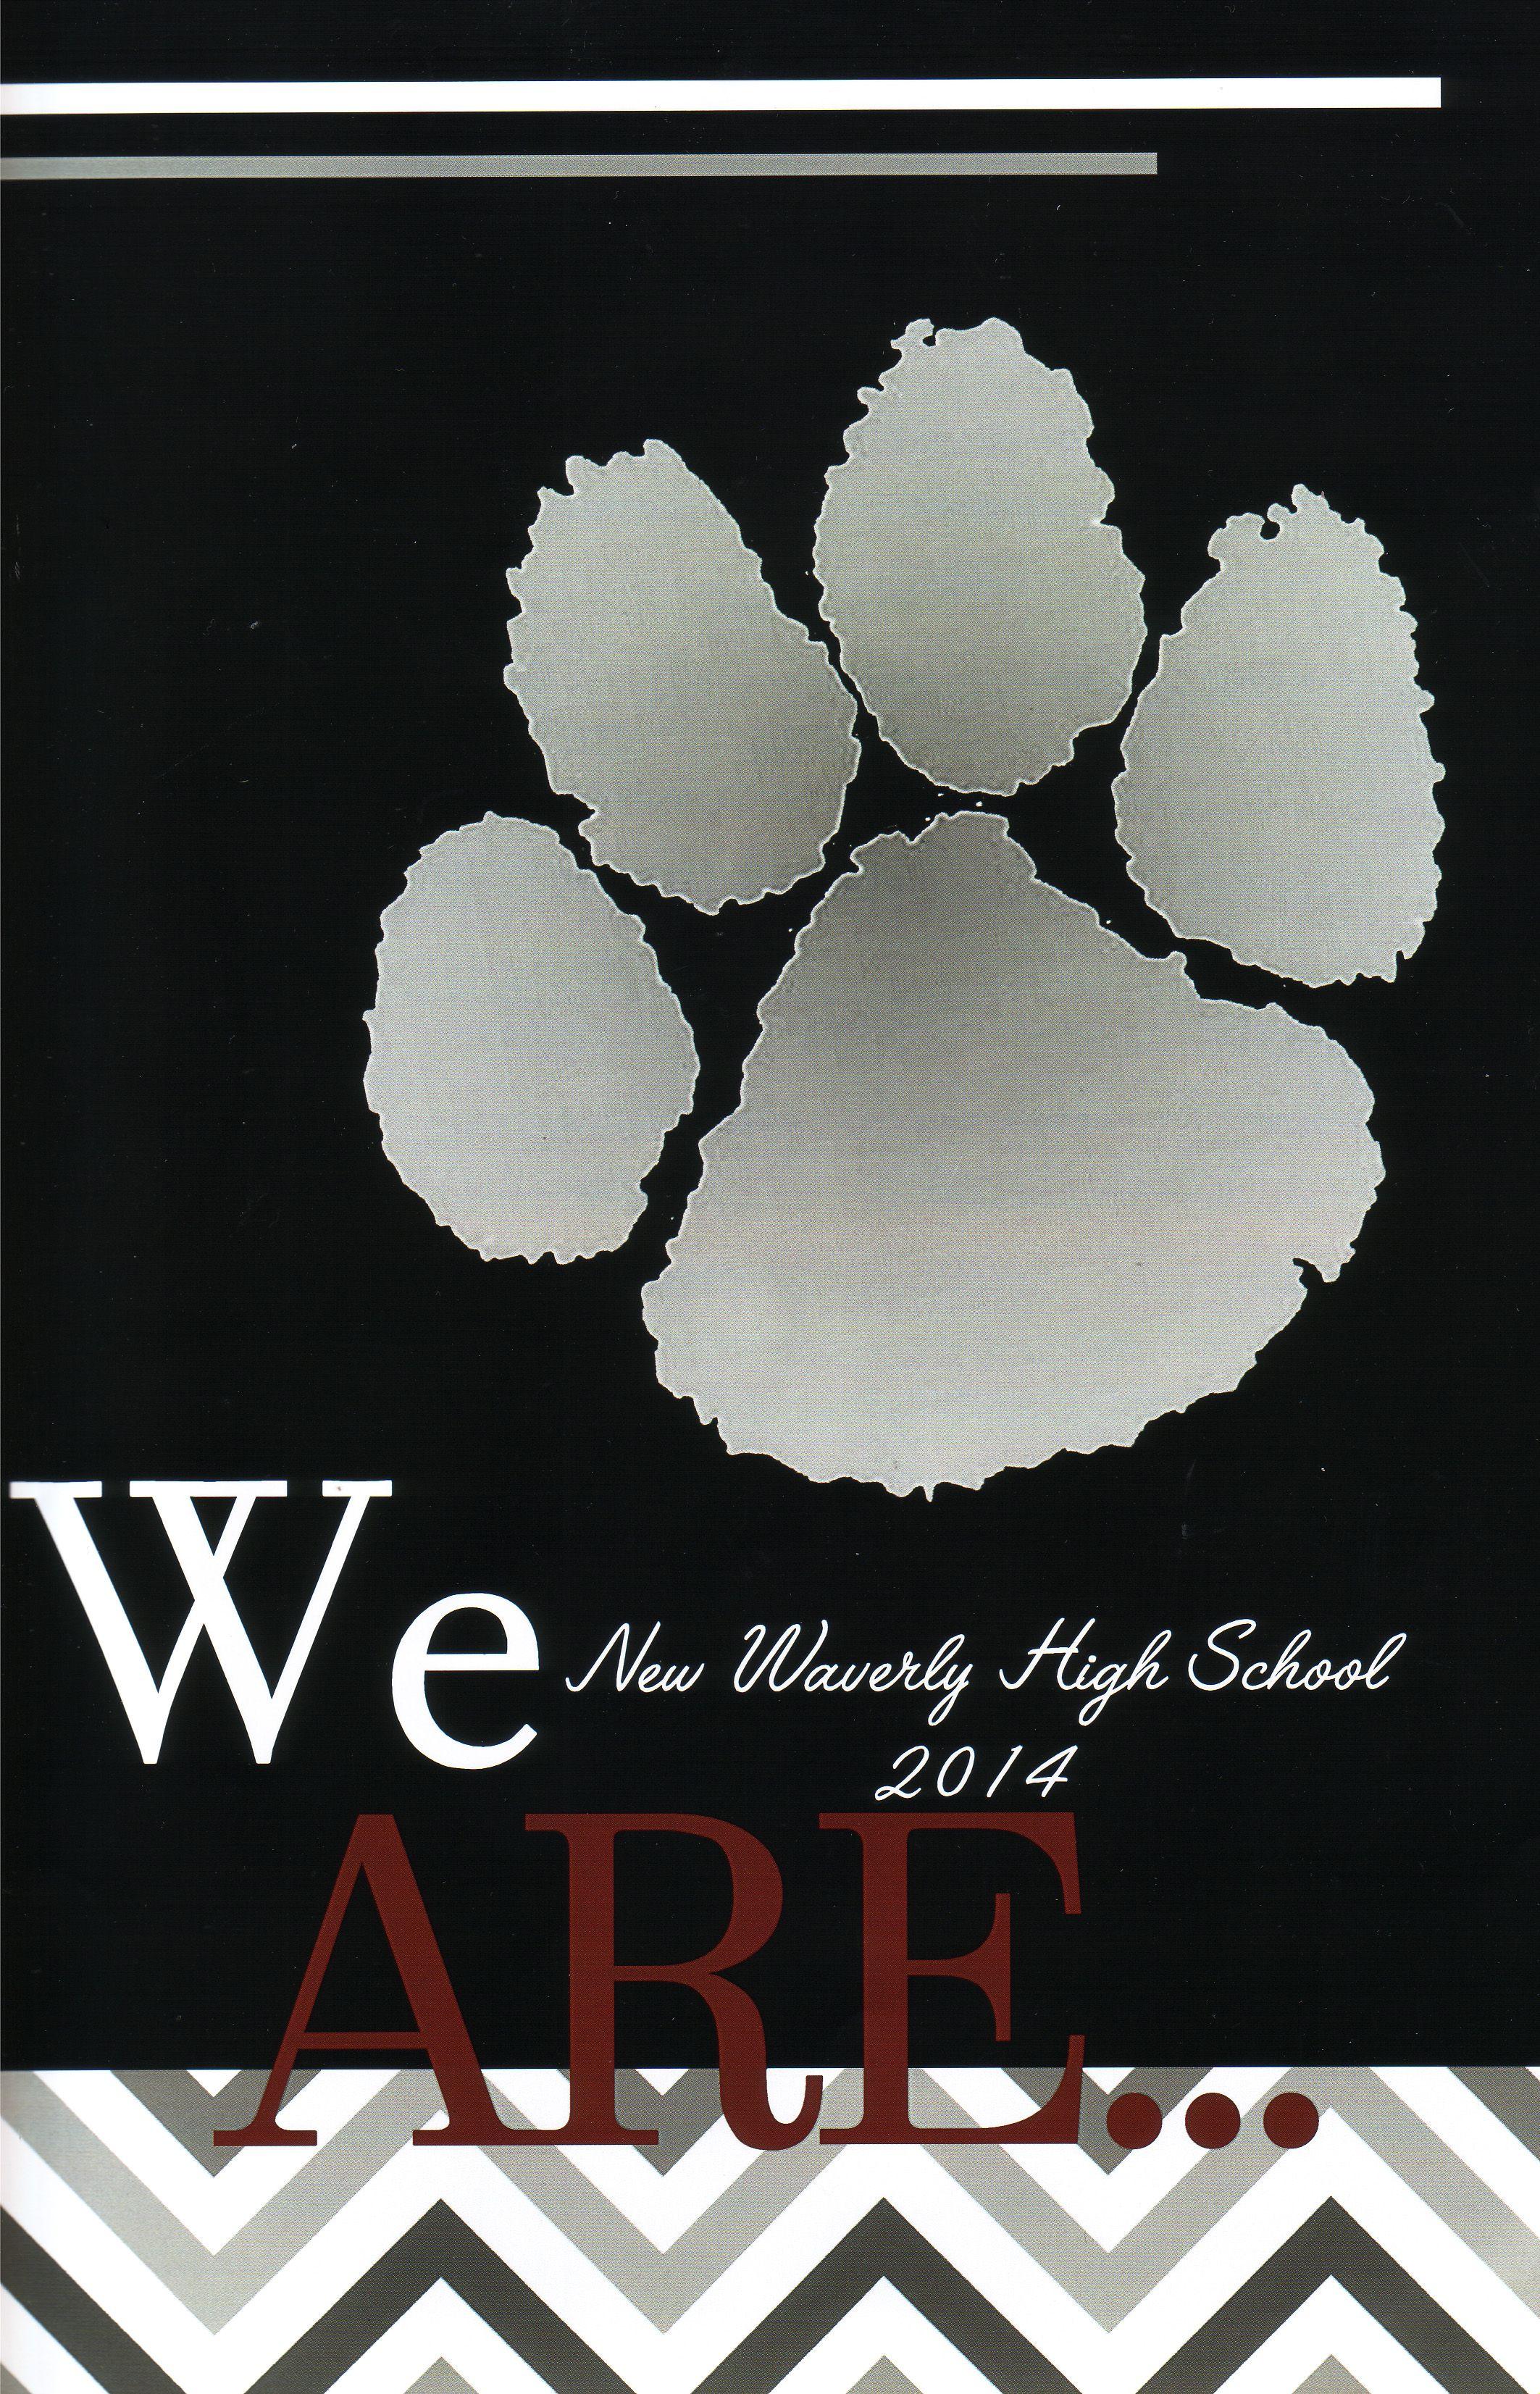 Elementary school scrapbook ideas - Bestofpicture Com Images Yearbook Covers 2014 2015